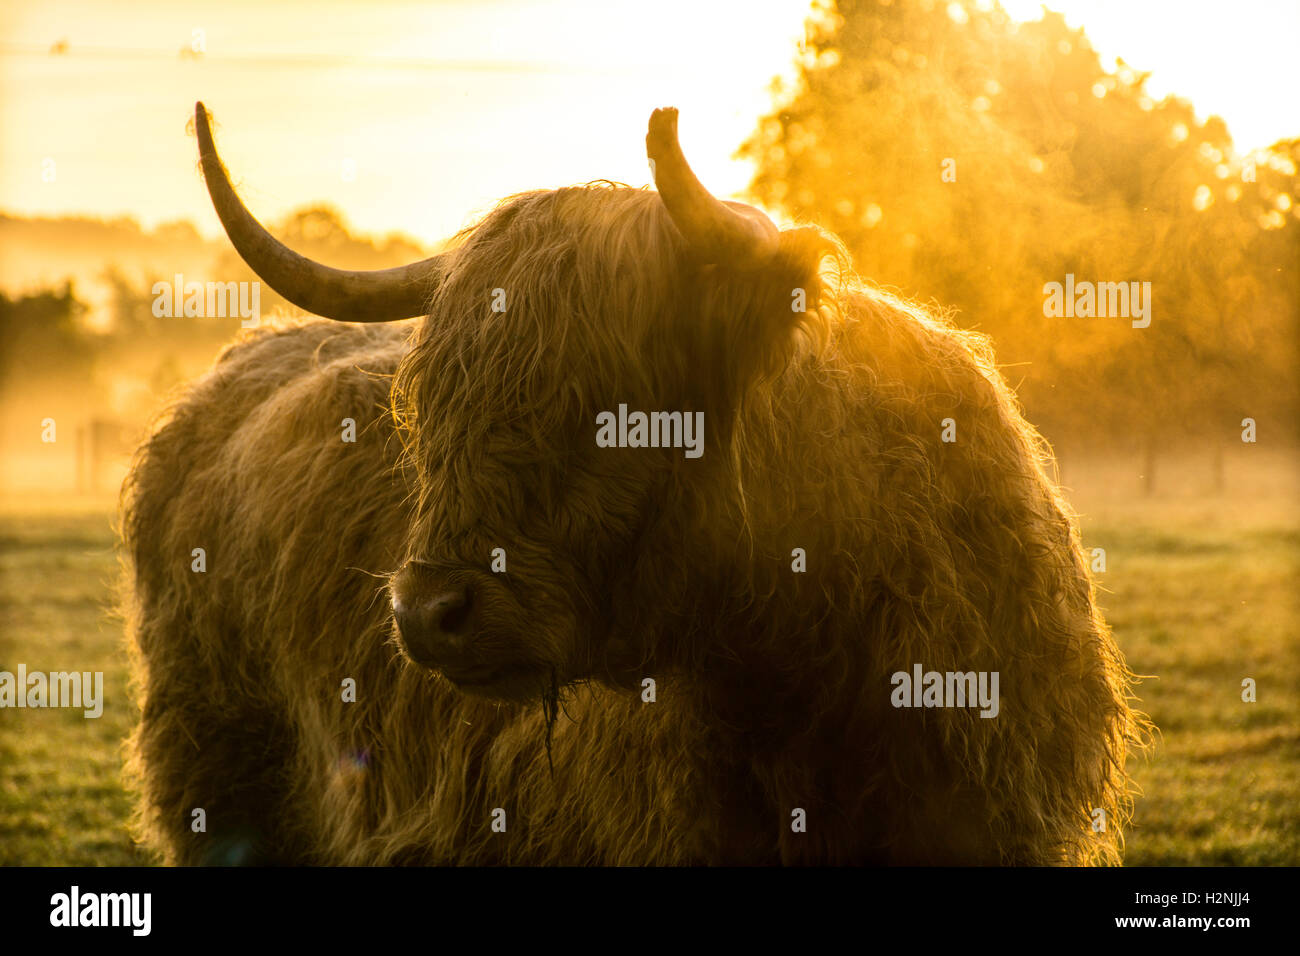 Highland cow al amanecer. Imagen De Stock